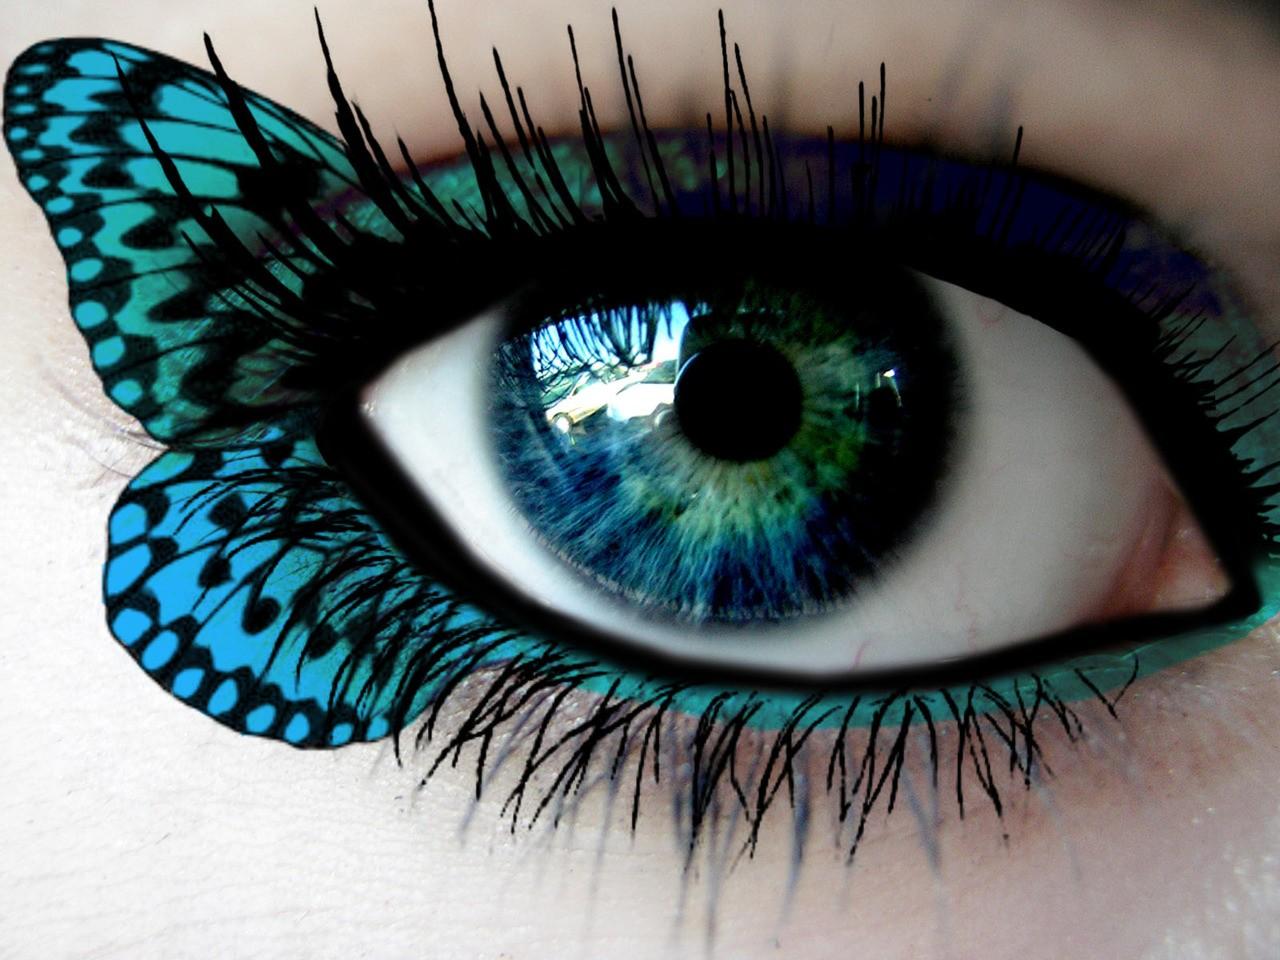 Download Beautiful Eyes Wallpaper Full HD Wallpapers 1280x960